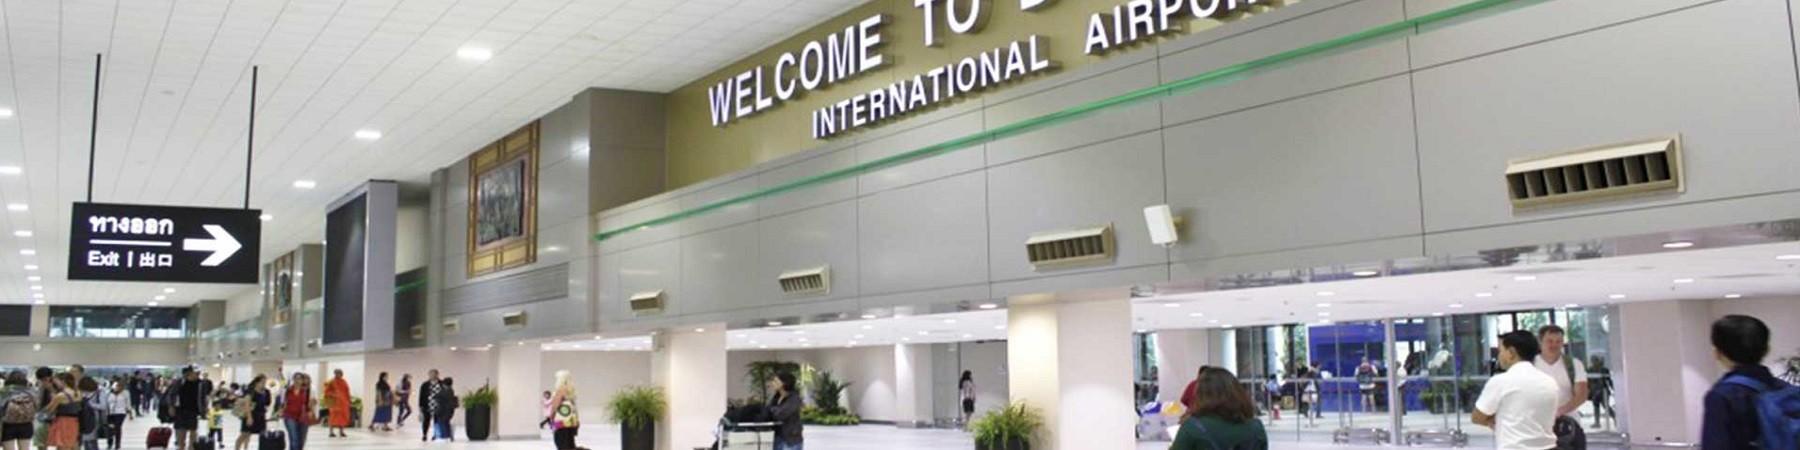 Top 10 Hotels Near Suvarnabhumi Intl Airport (BKK) for